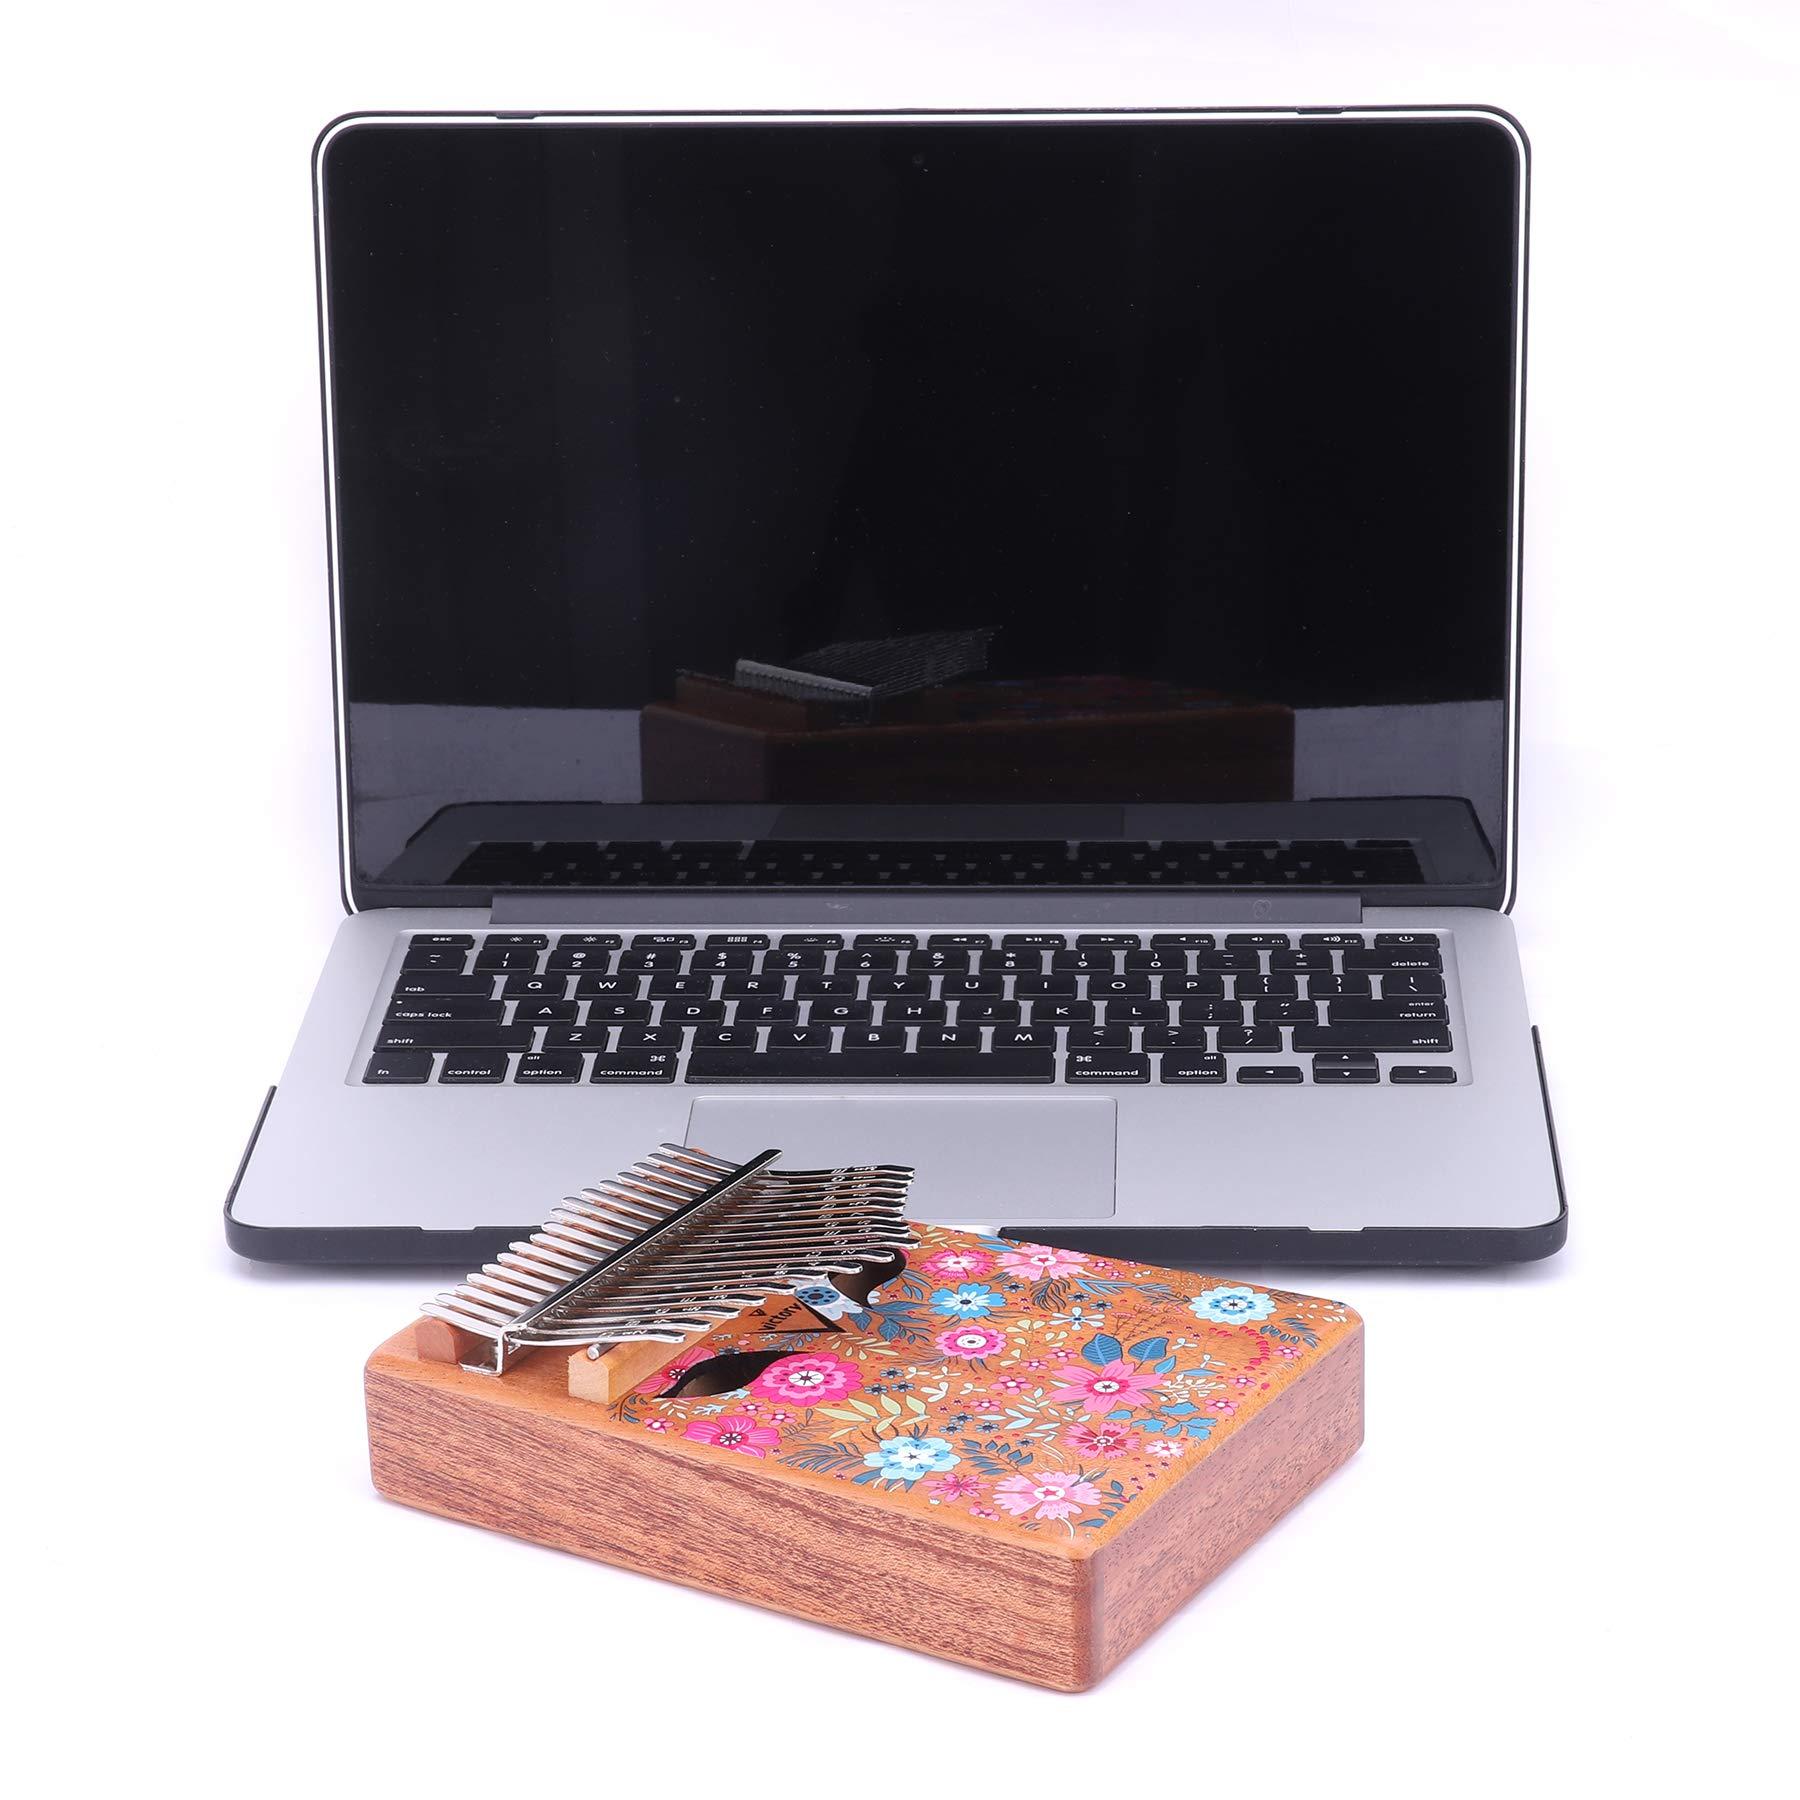 VI VICTORY 17 Key 3D Painted Kalimba African Thumb Piano Finger Percussion Keyboard Music Instruments - Sakura 2 by VI VICTORY (Image #5)